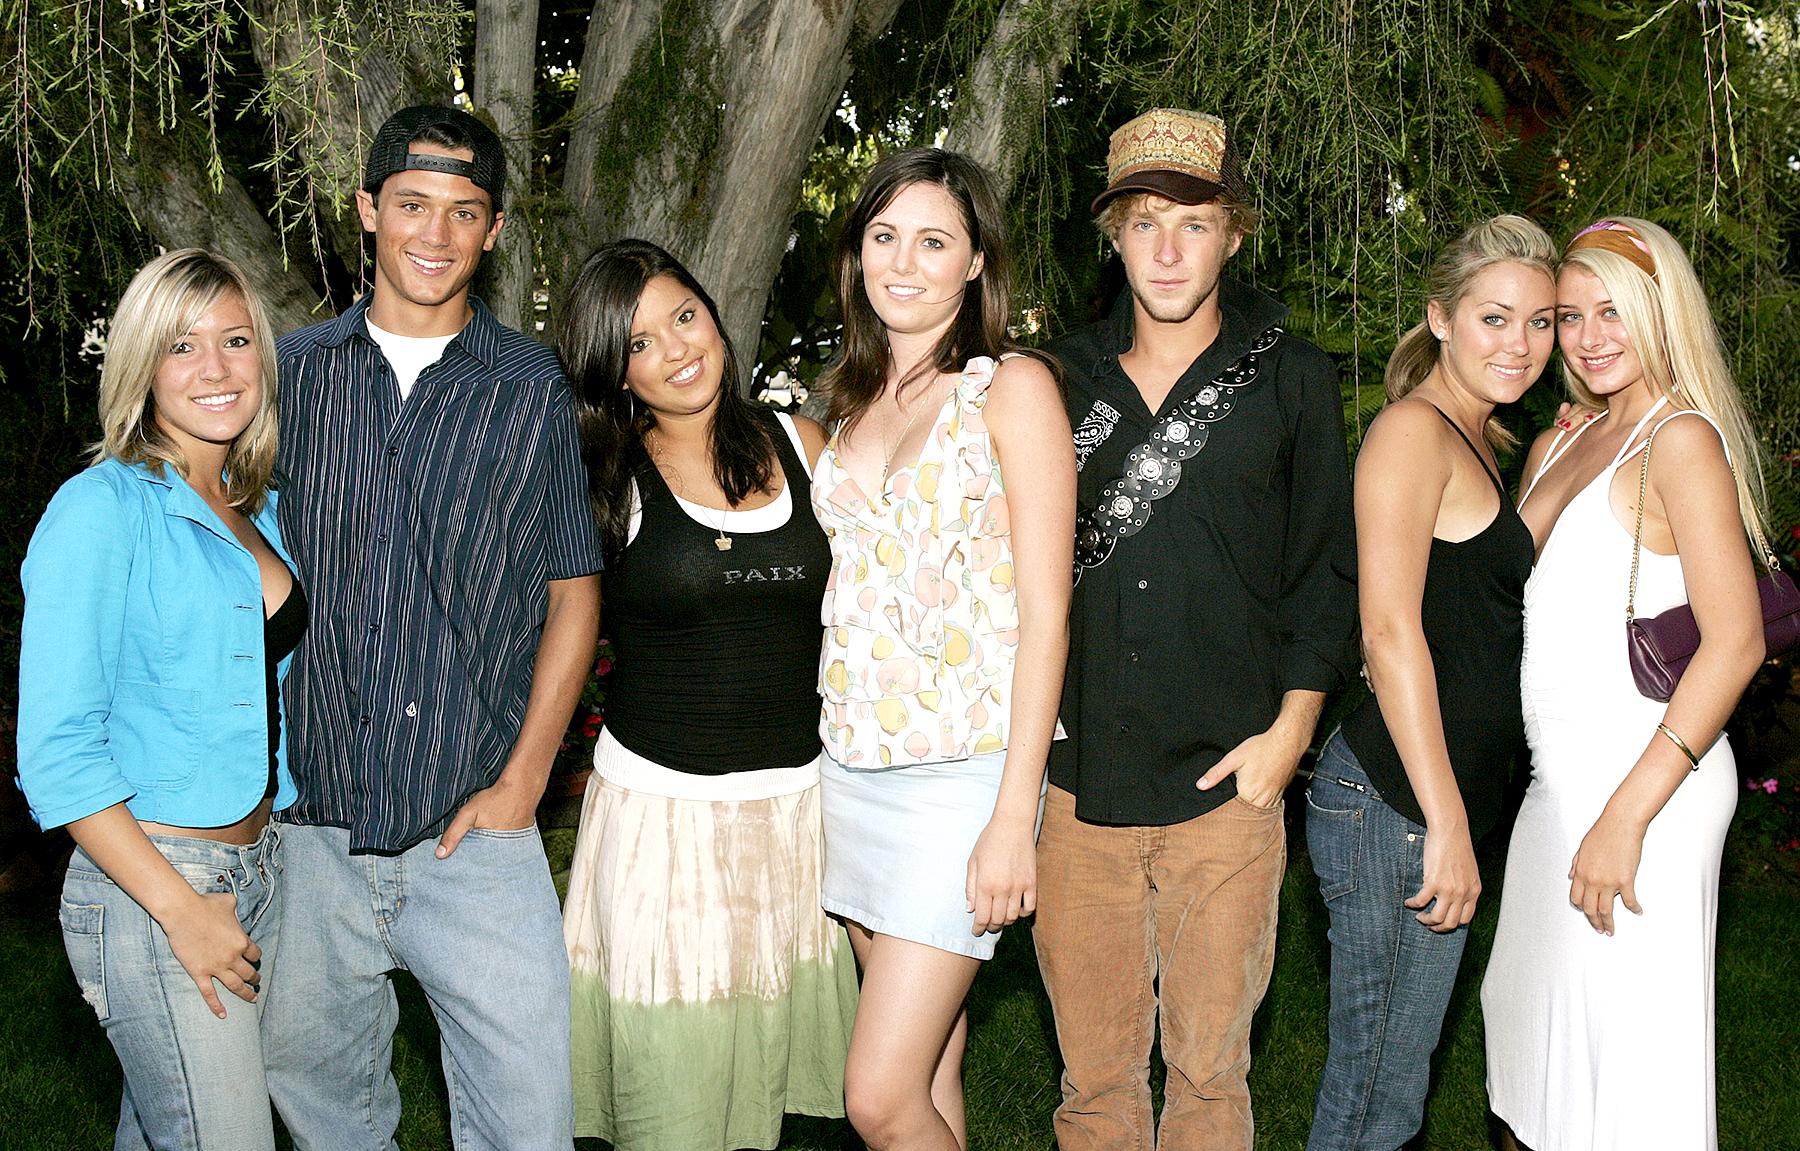 Kristin Cavallari, Stephen Colletti, Lauren Conrad and castmembers of MTV's